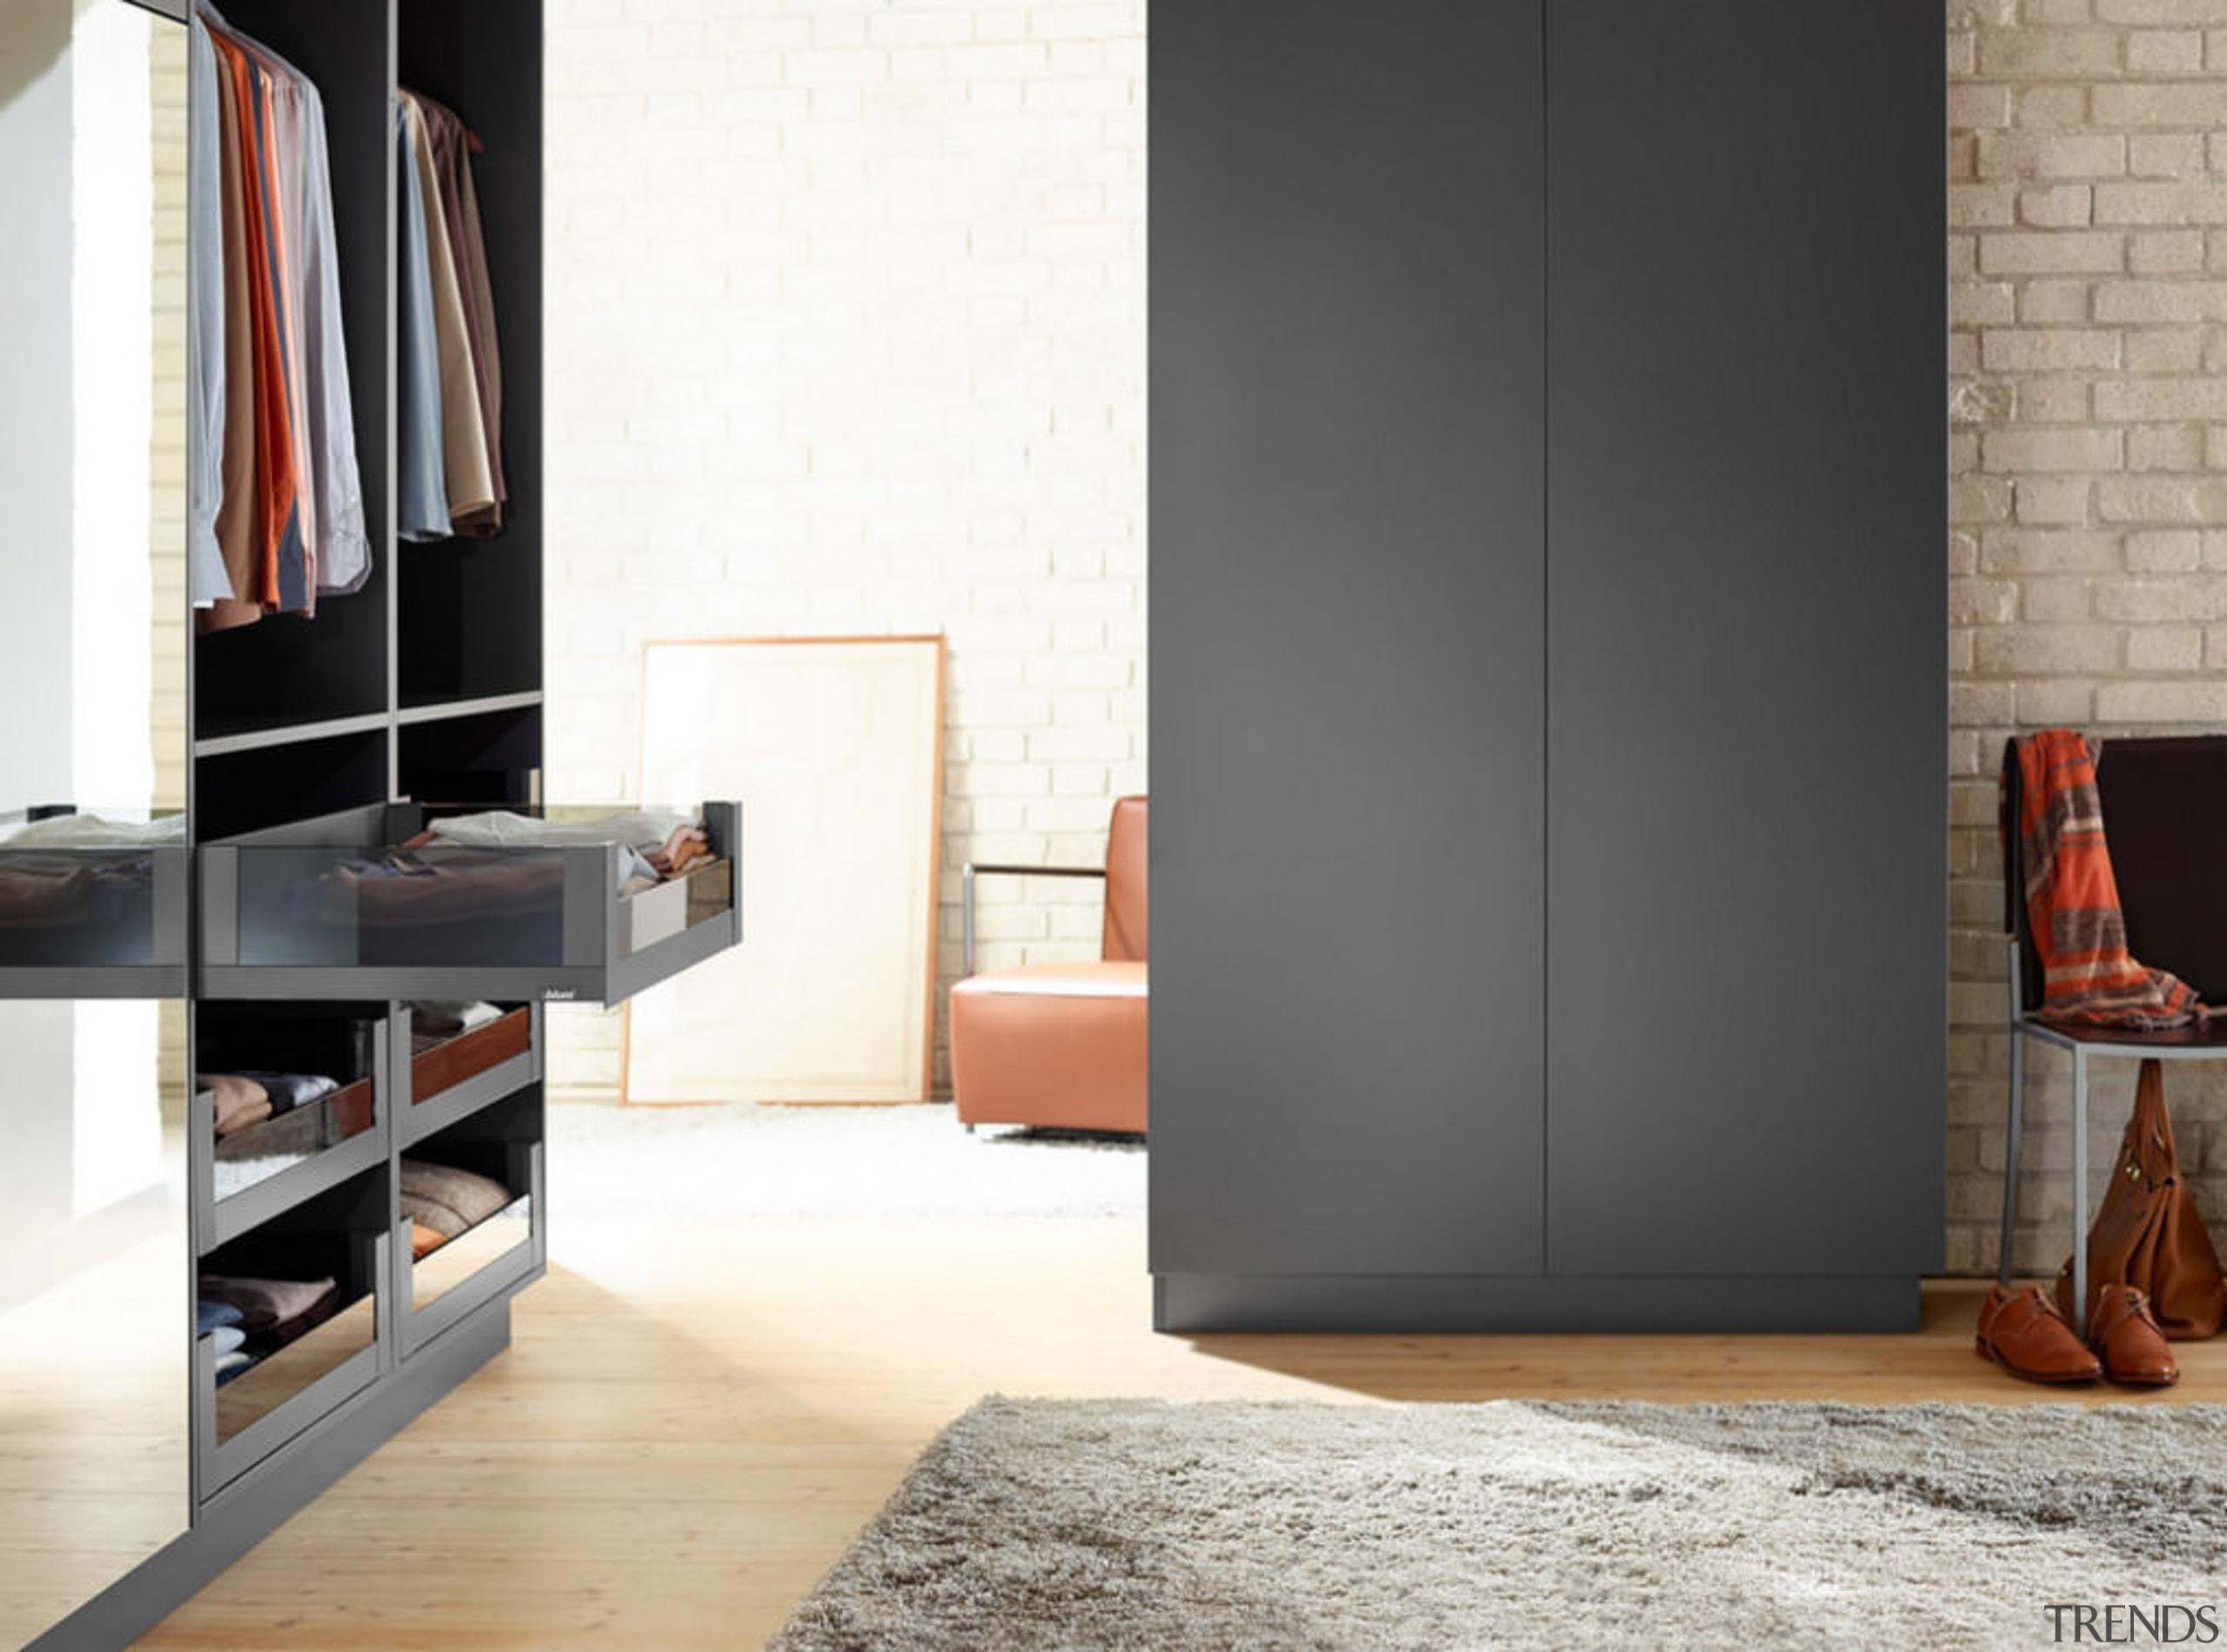 Blum's LEGRABOX drawer system makes decluttering a closet, door, floor, furniture, interior design, product design, room, wardrobe, white